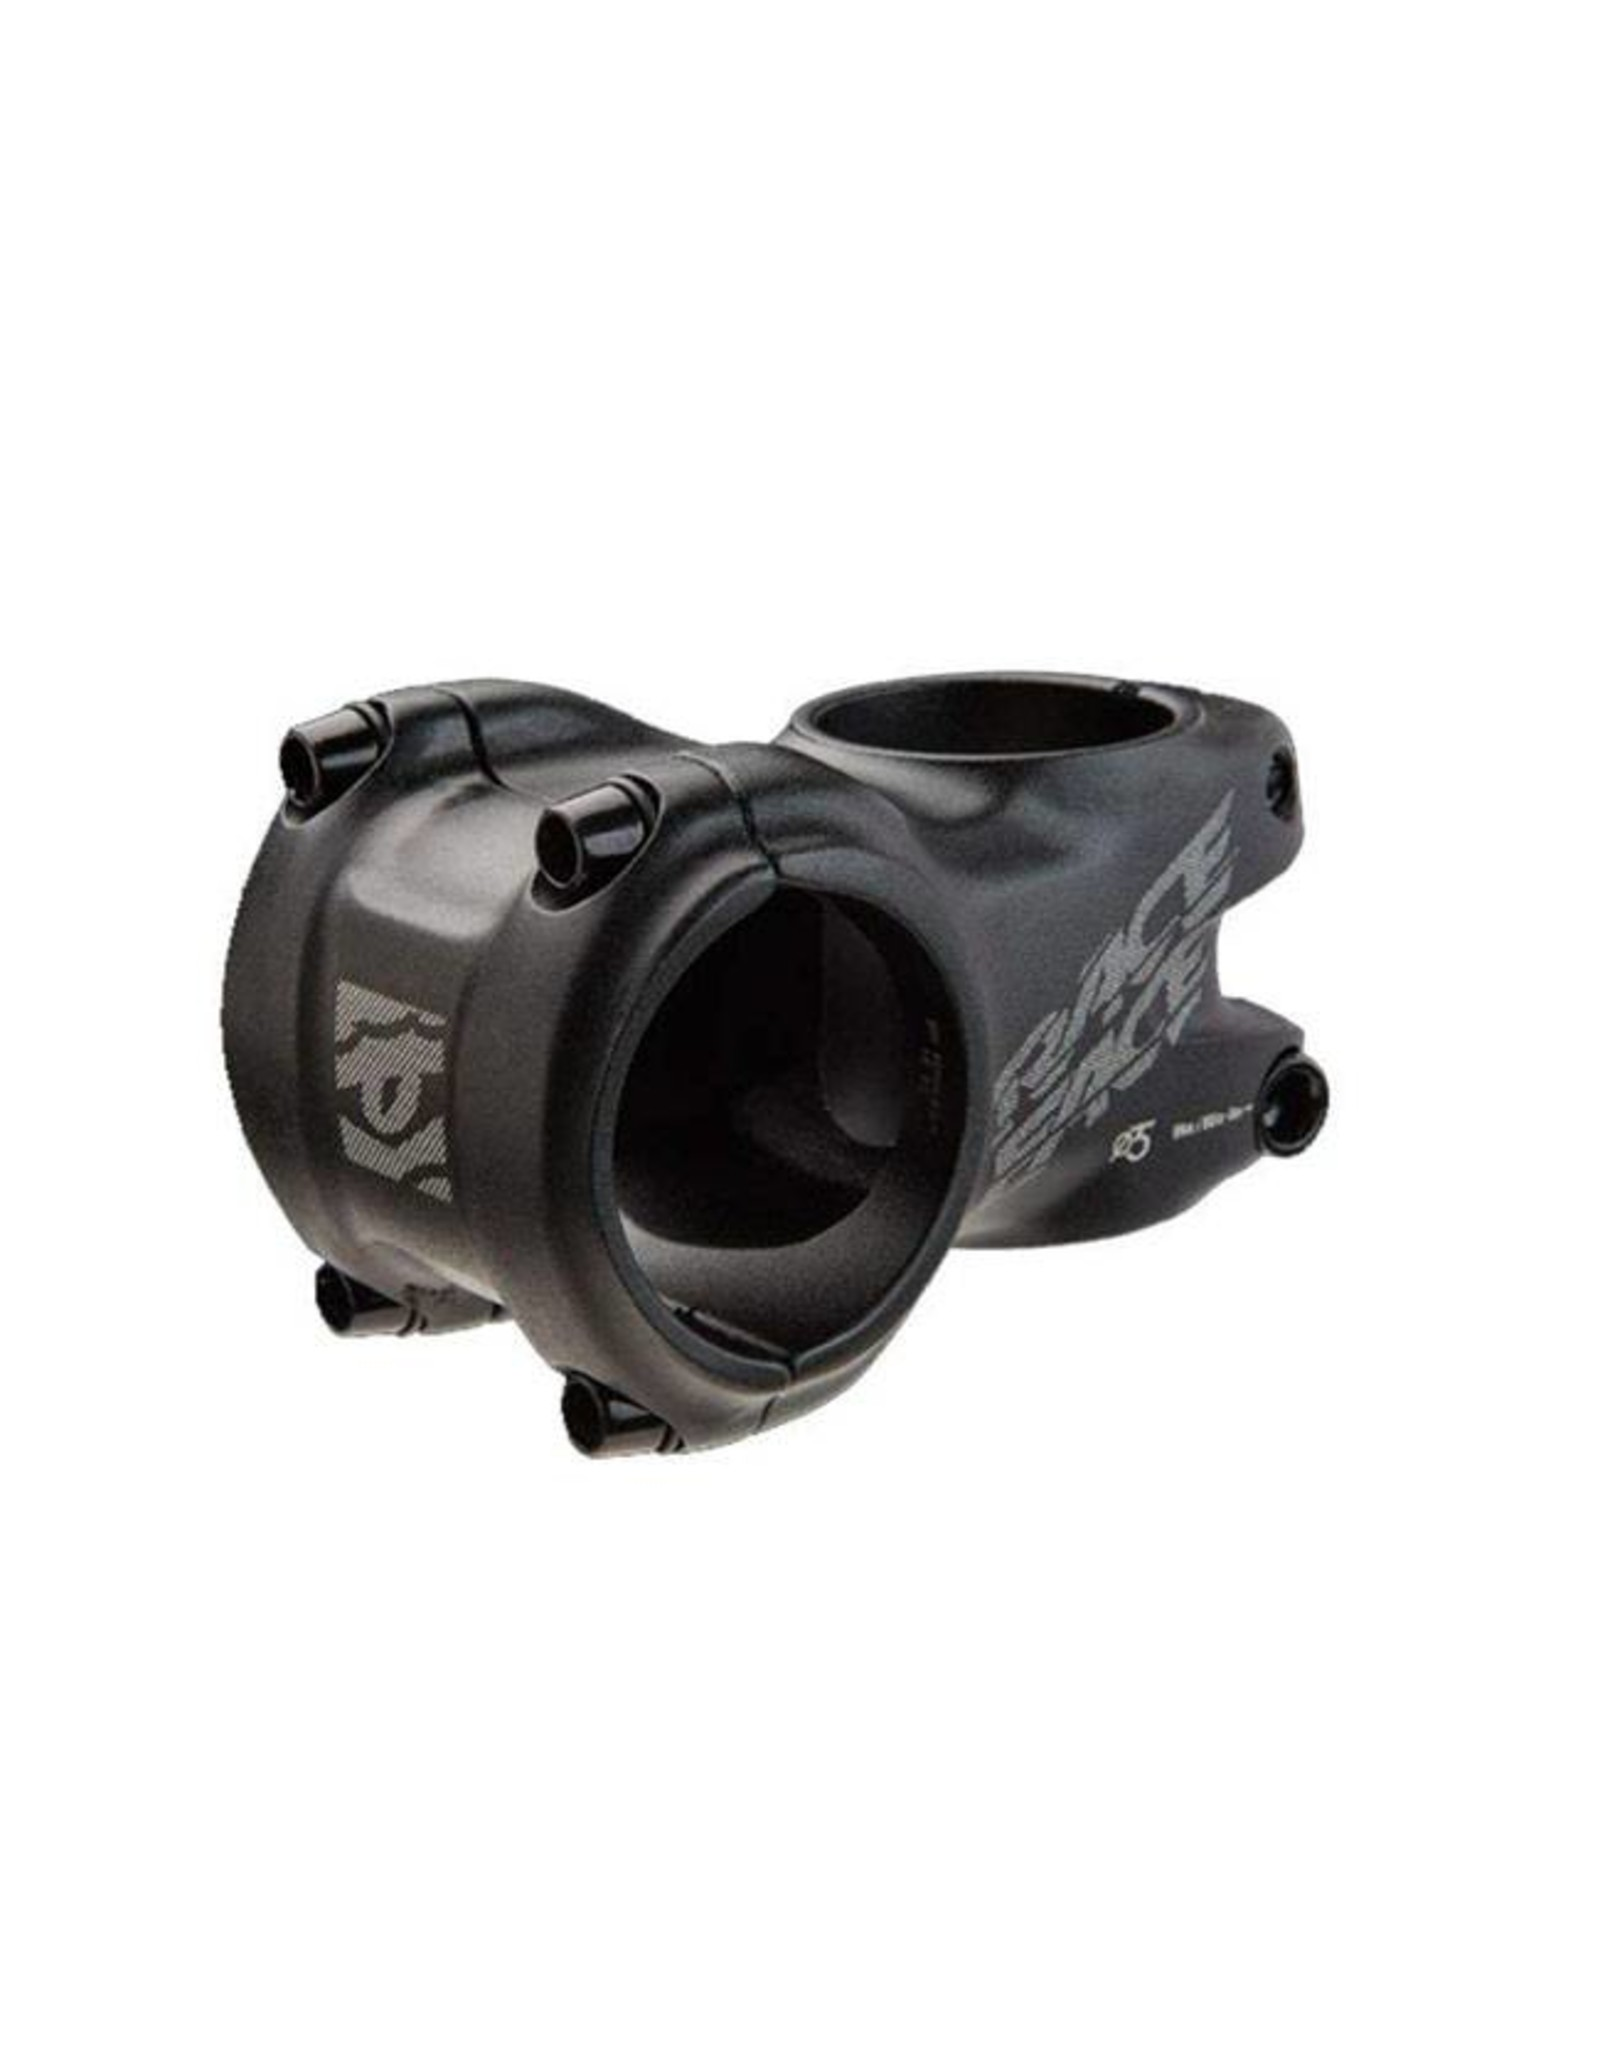 RaceFace RaceFace Chester 35 Stem: 60mm x 35mm +/- 0 degree Black